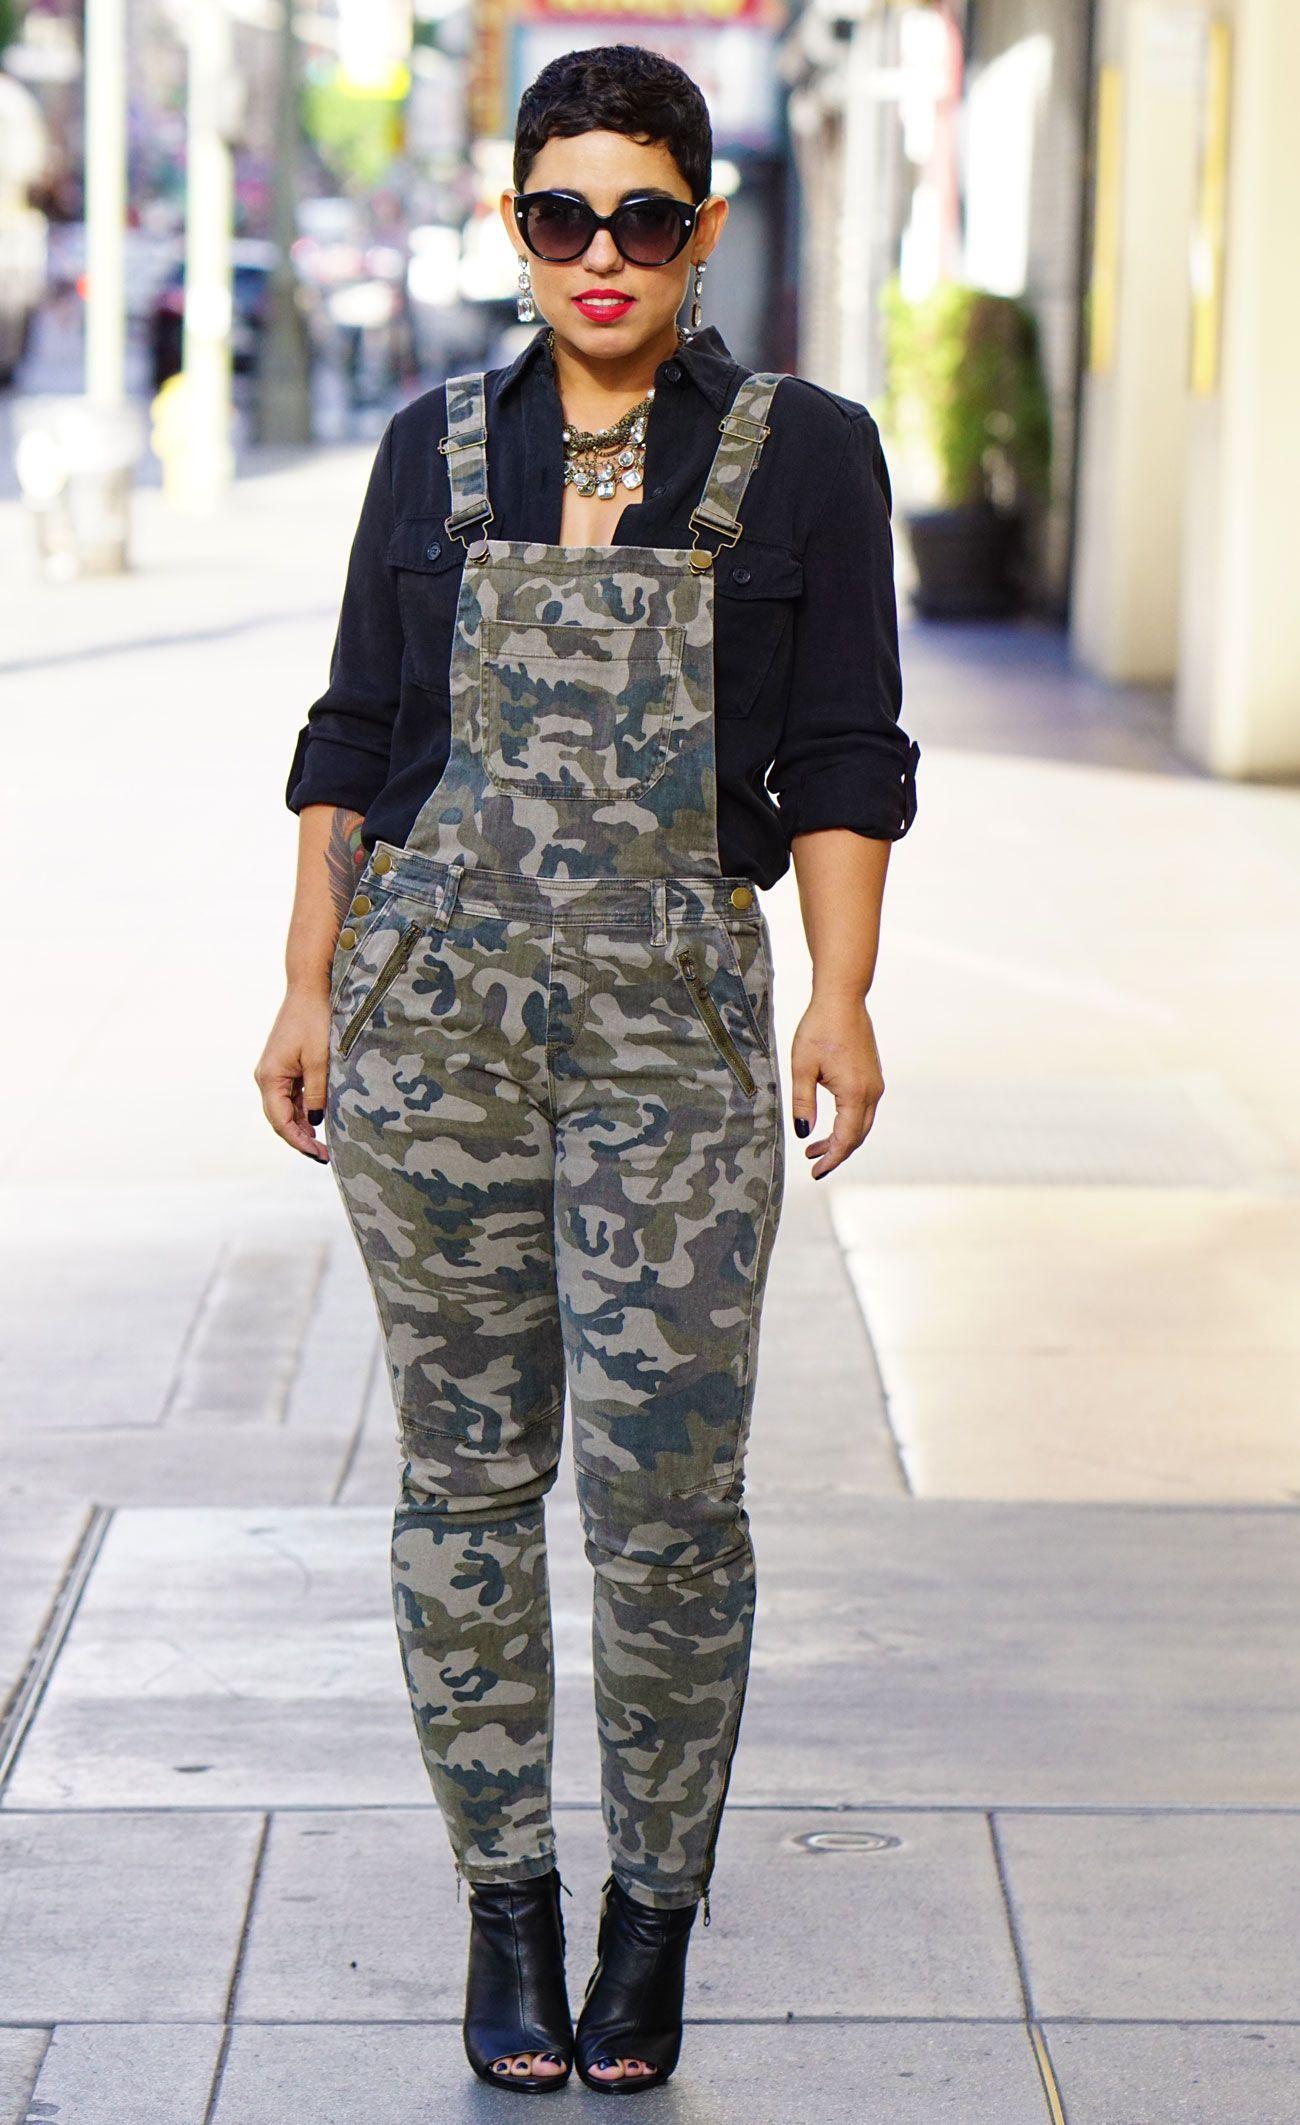 58e437c302b59 dsc00092 Camo Fashion, Military Fashion, Diva Fashion, Formal Fashion,  Military Style,